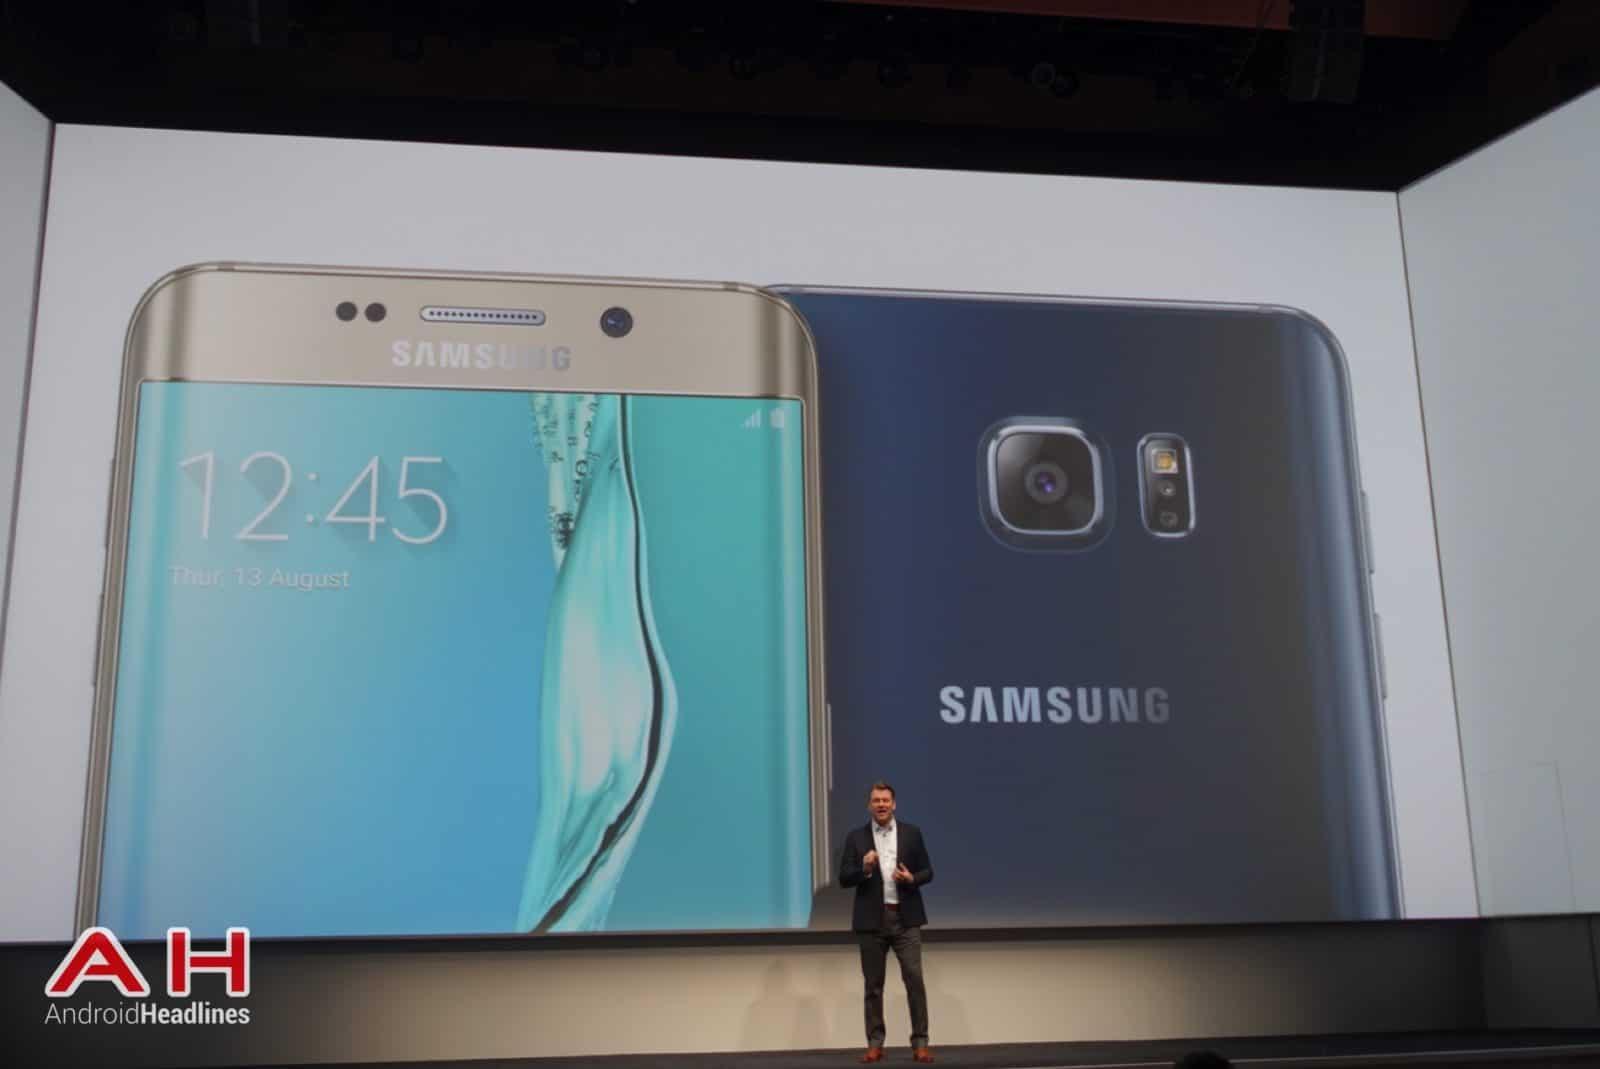 Samsung Unpacked 15 02 AH 17